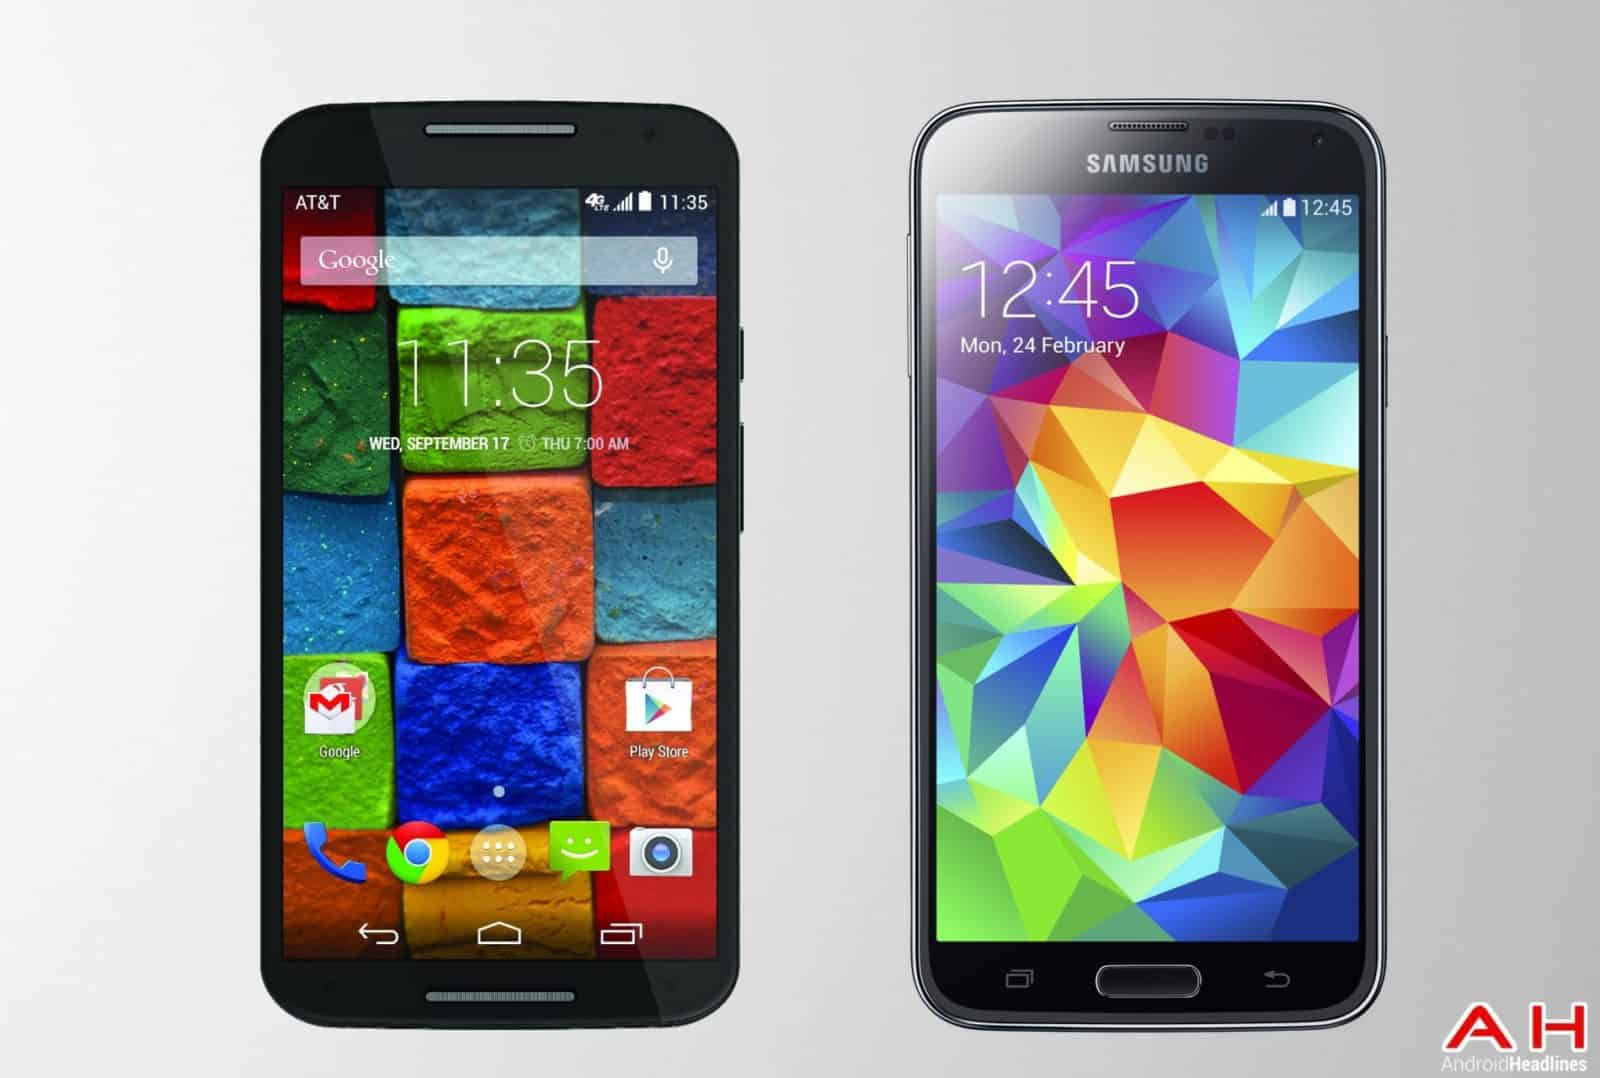 AH Motorola Moto X 2014 vs Samsung Galaxy S5